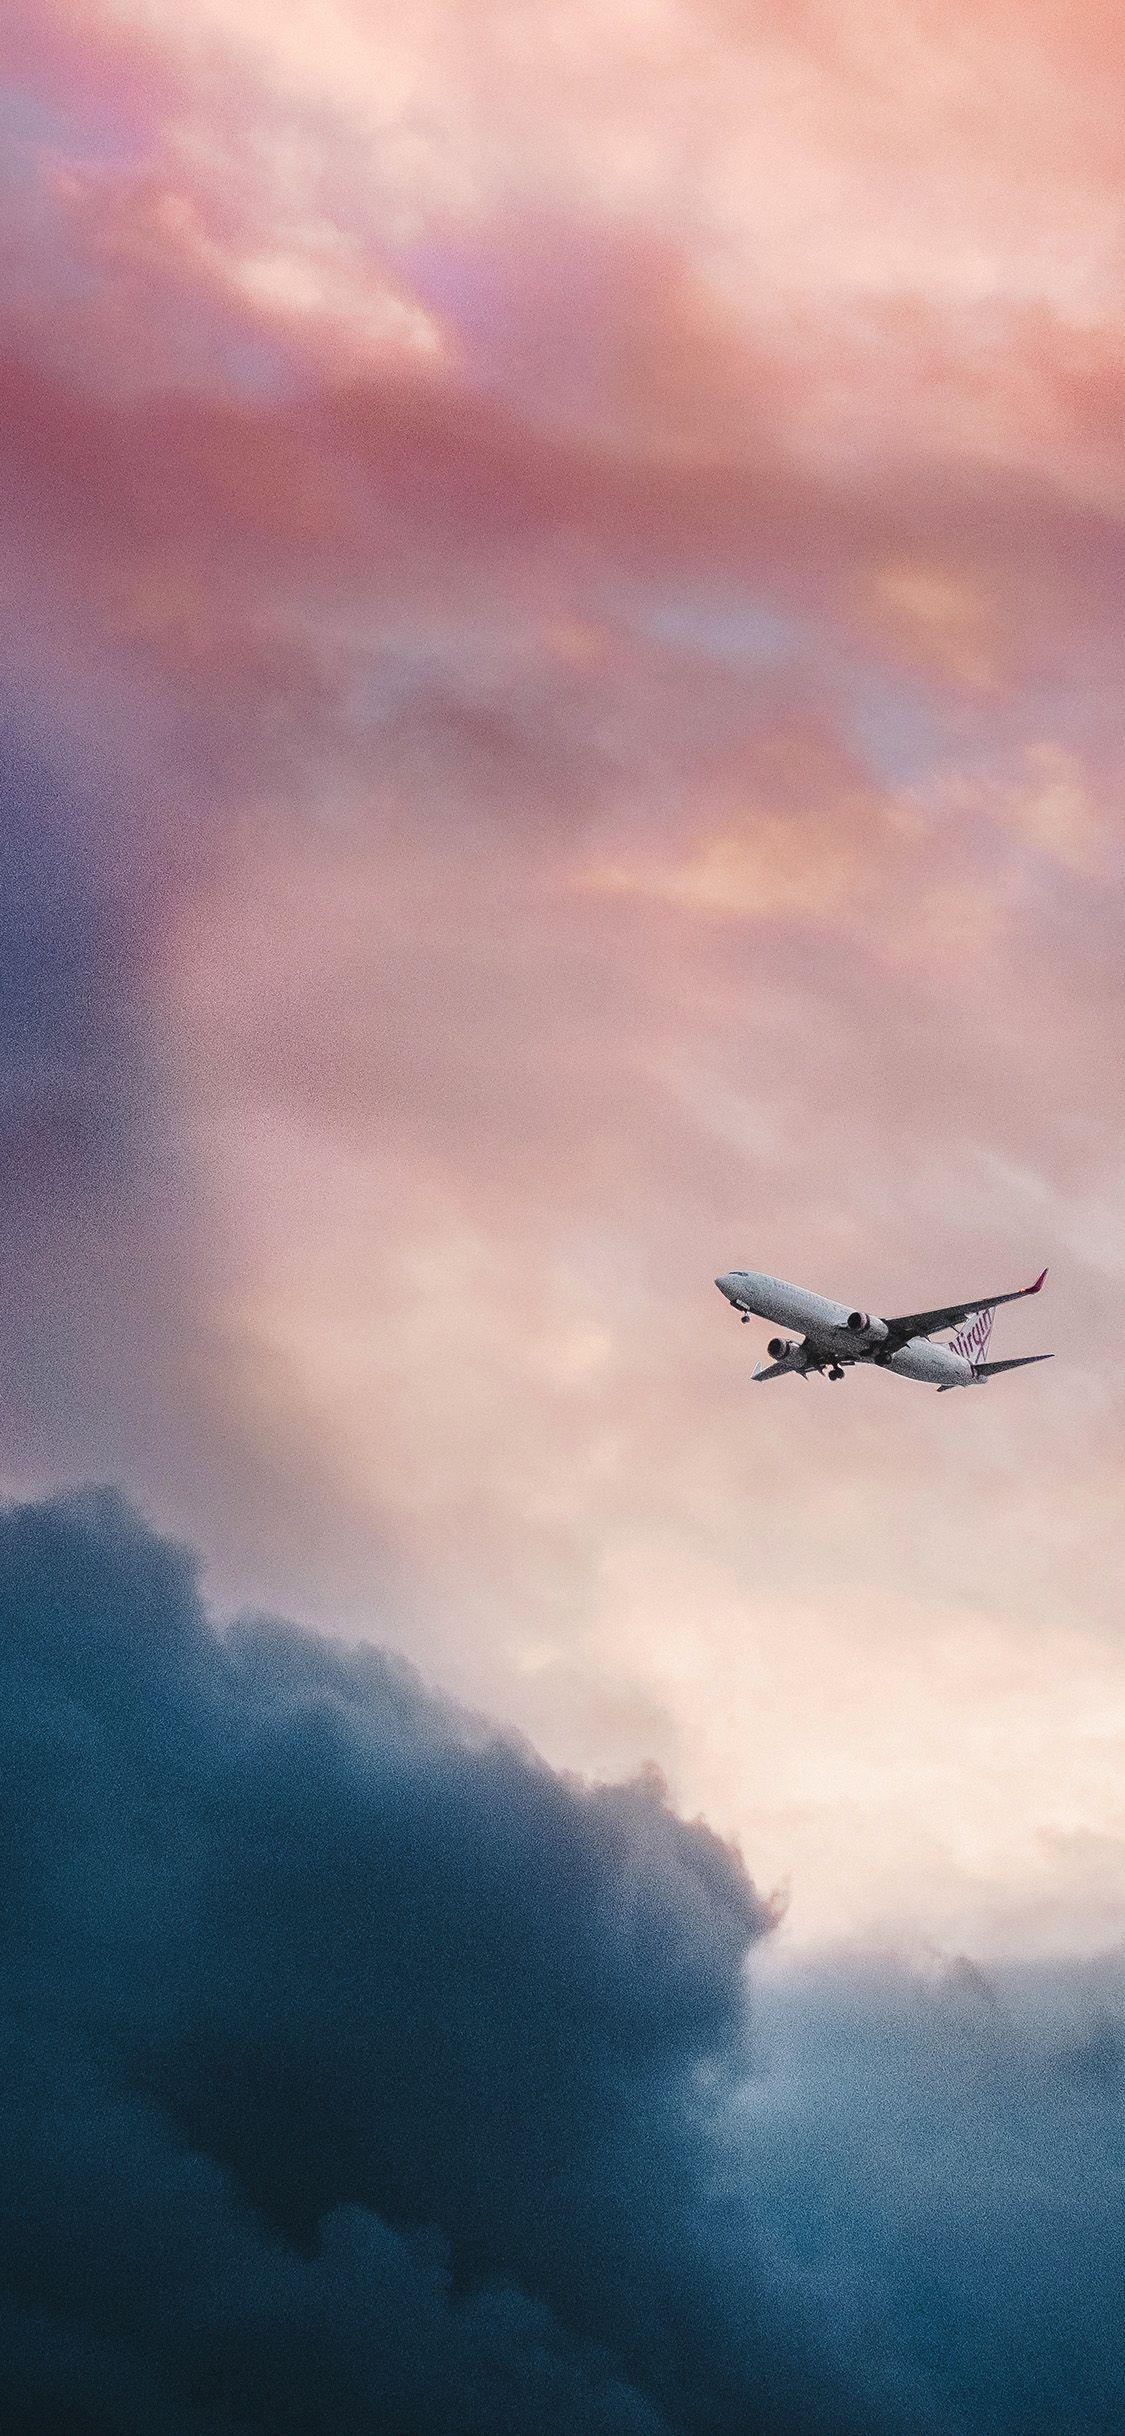 nv09cloudplaneflyskynature via http//iPhoneXpapers